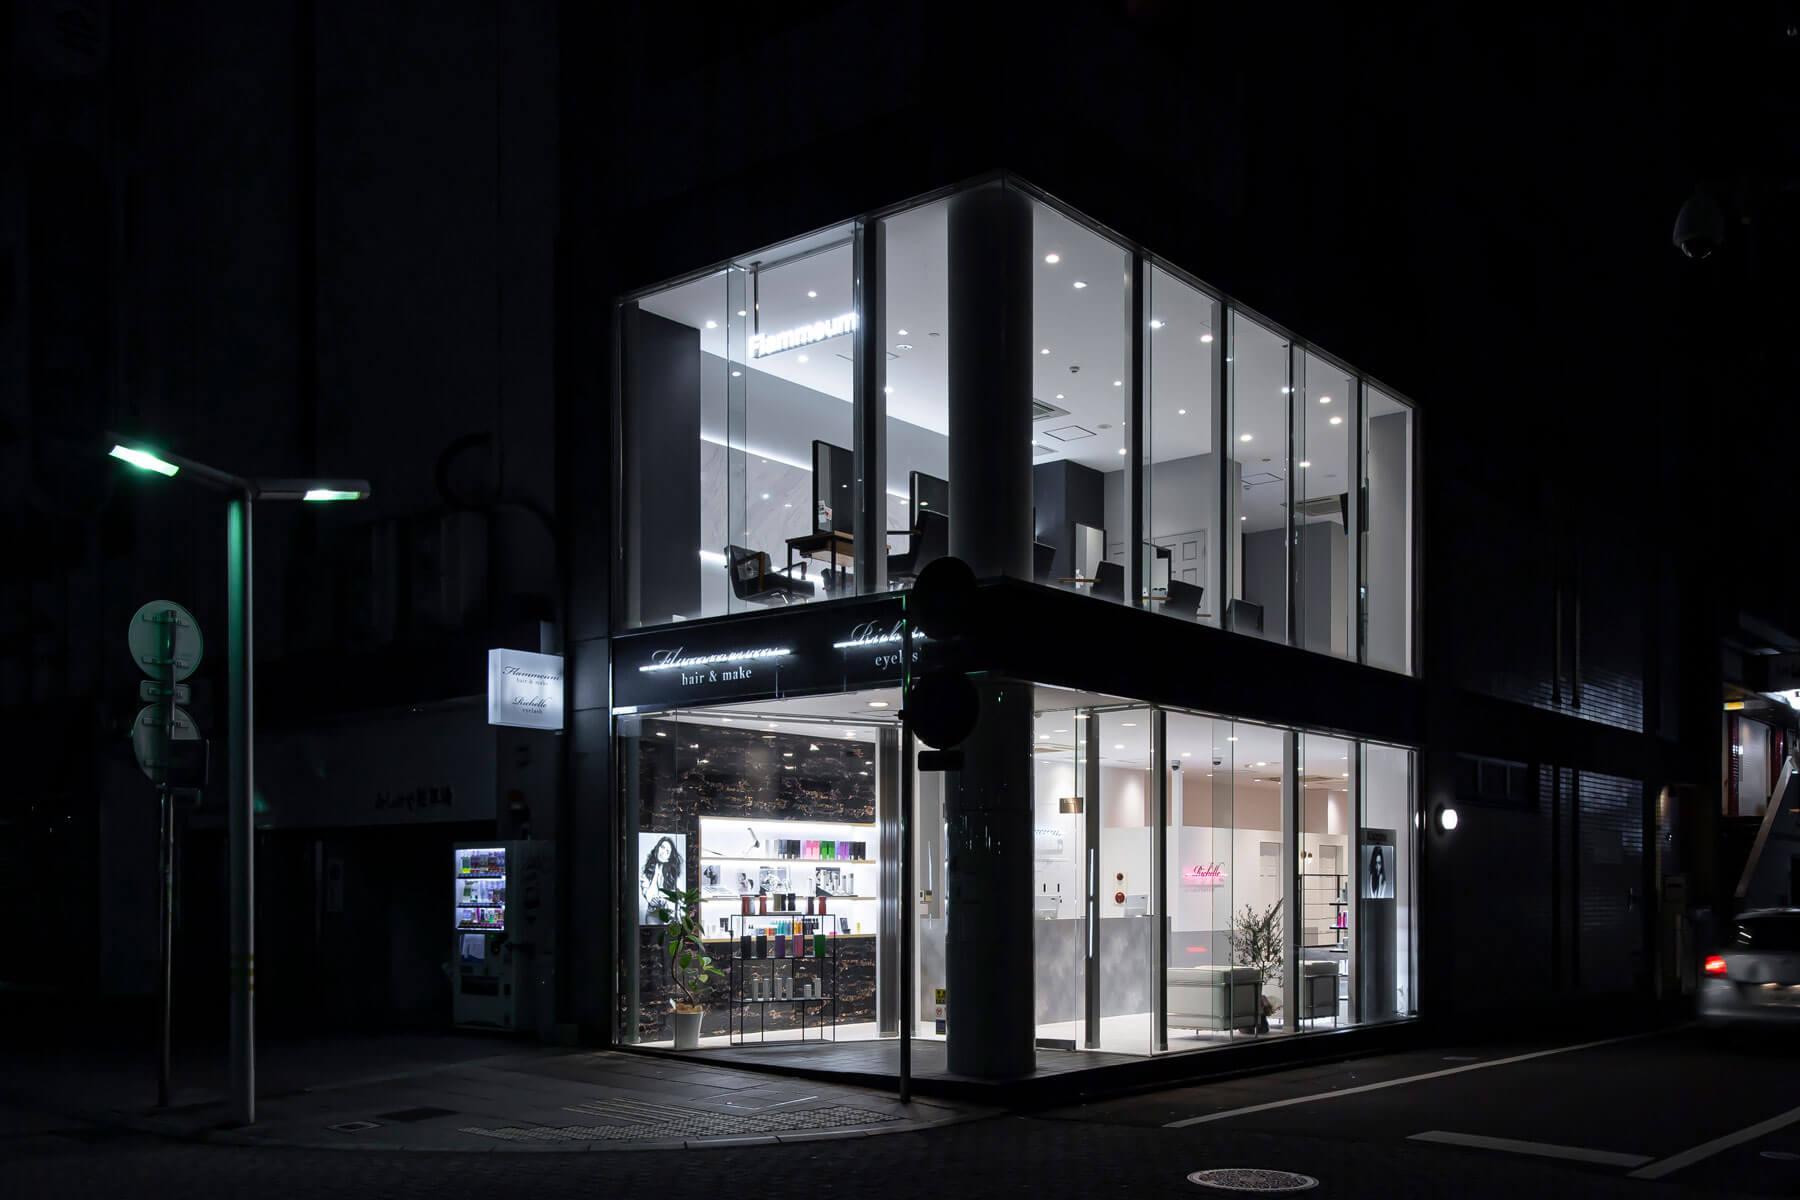 flammeum 静岡店/Shizuoka